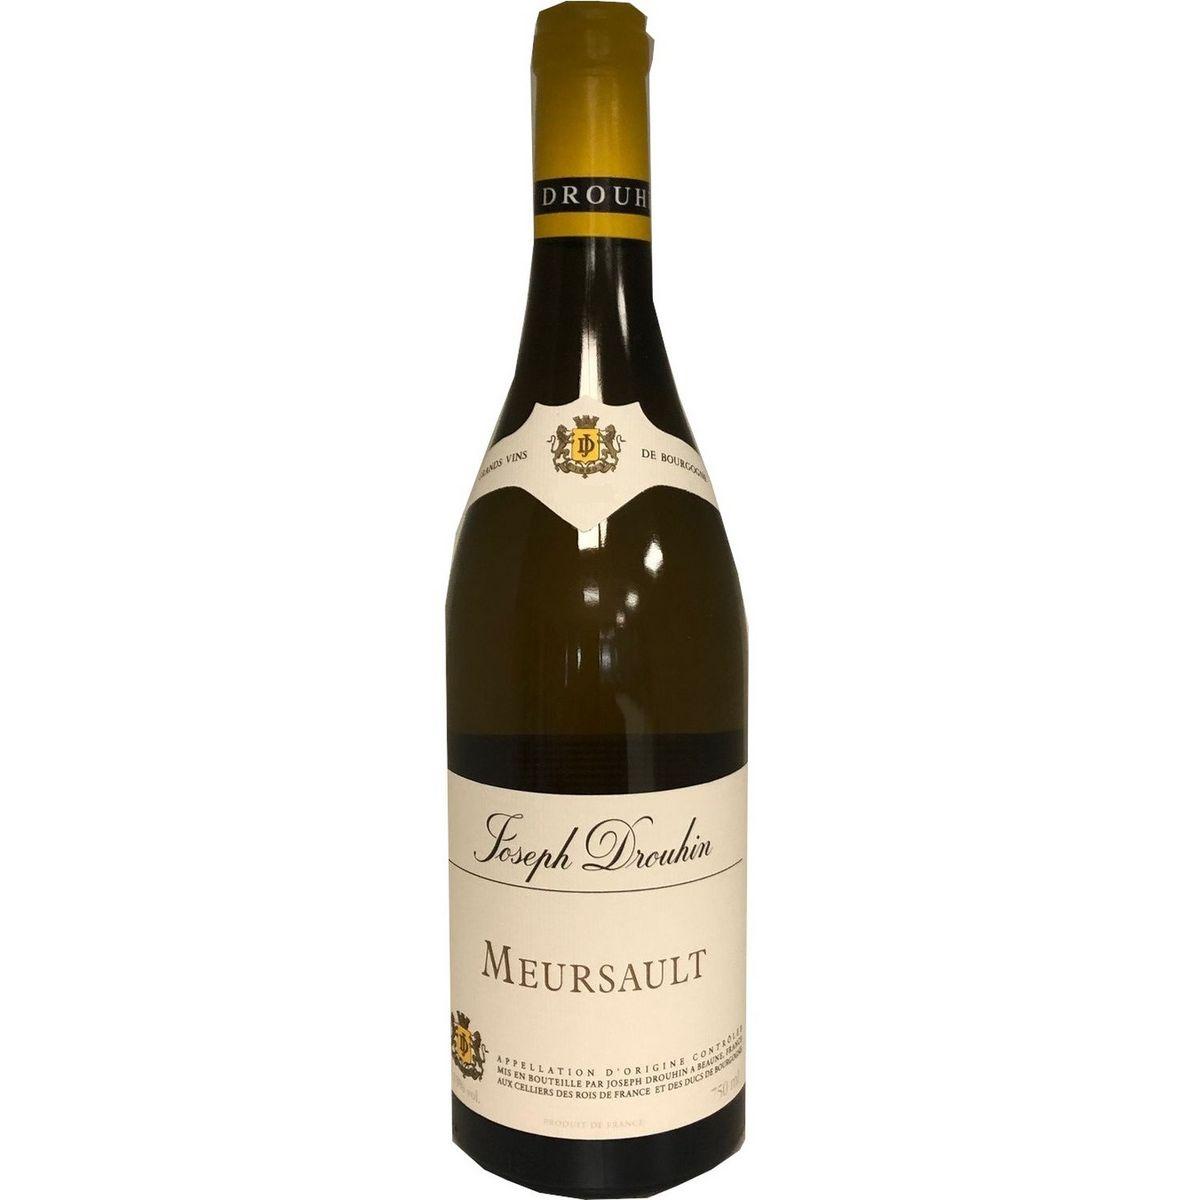 AOP Meursault Domaine Joseph Drouhin blanc 2018